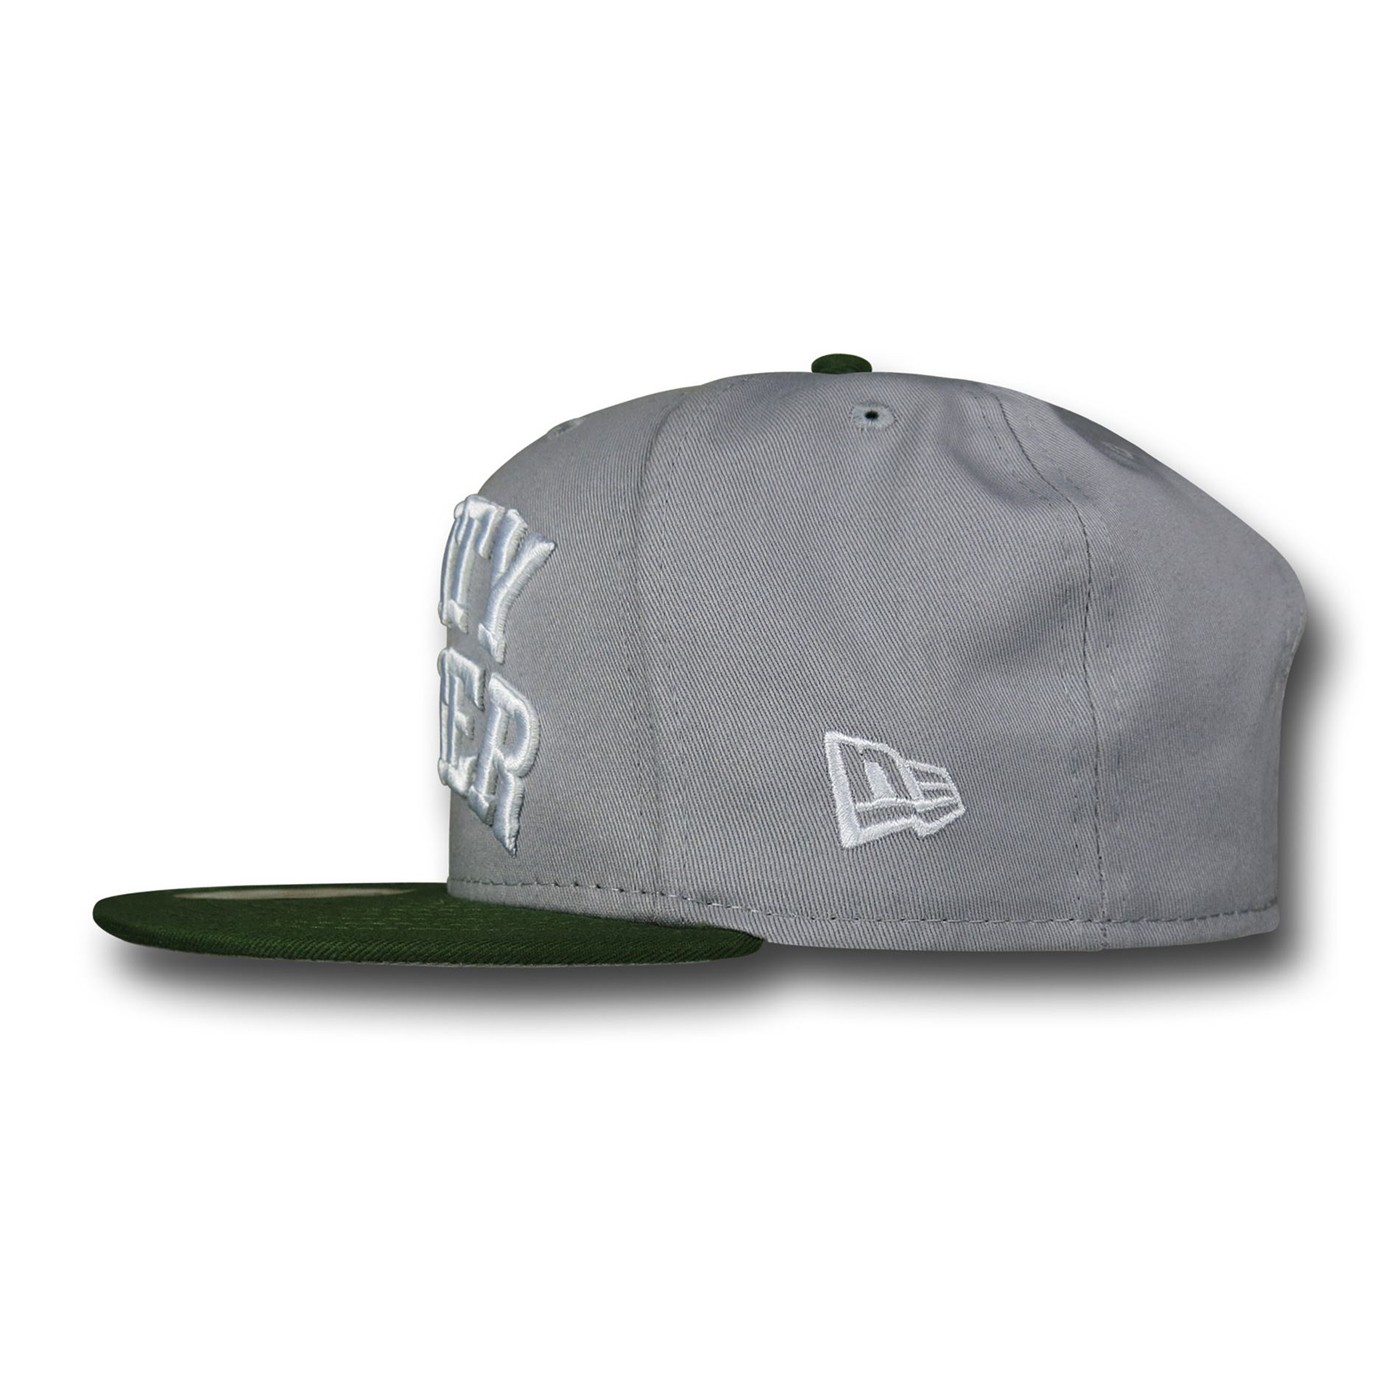 Bounty Hunter Cap